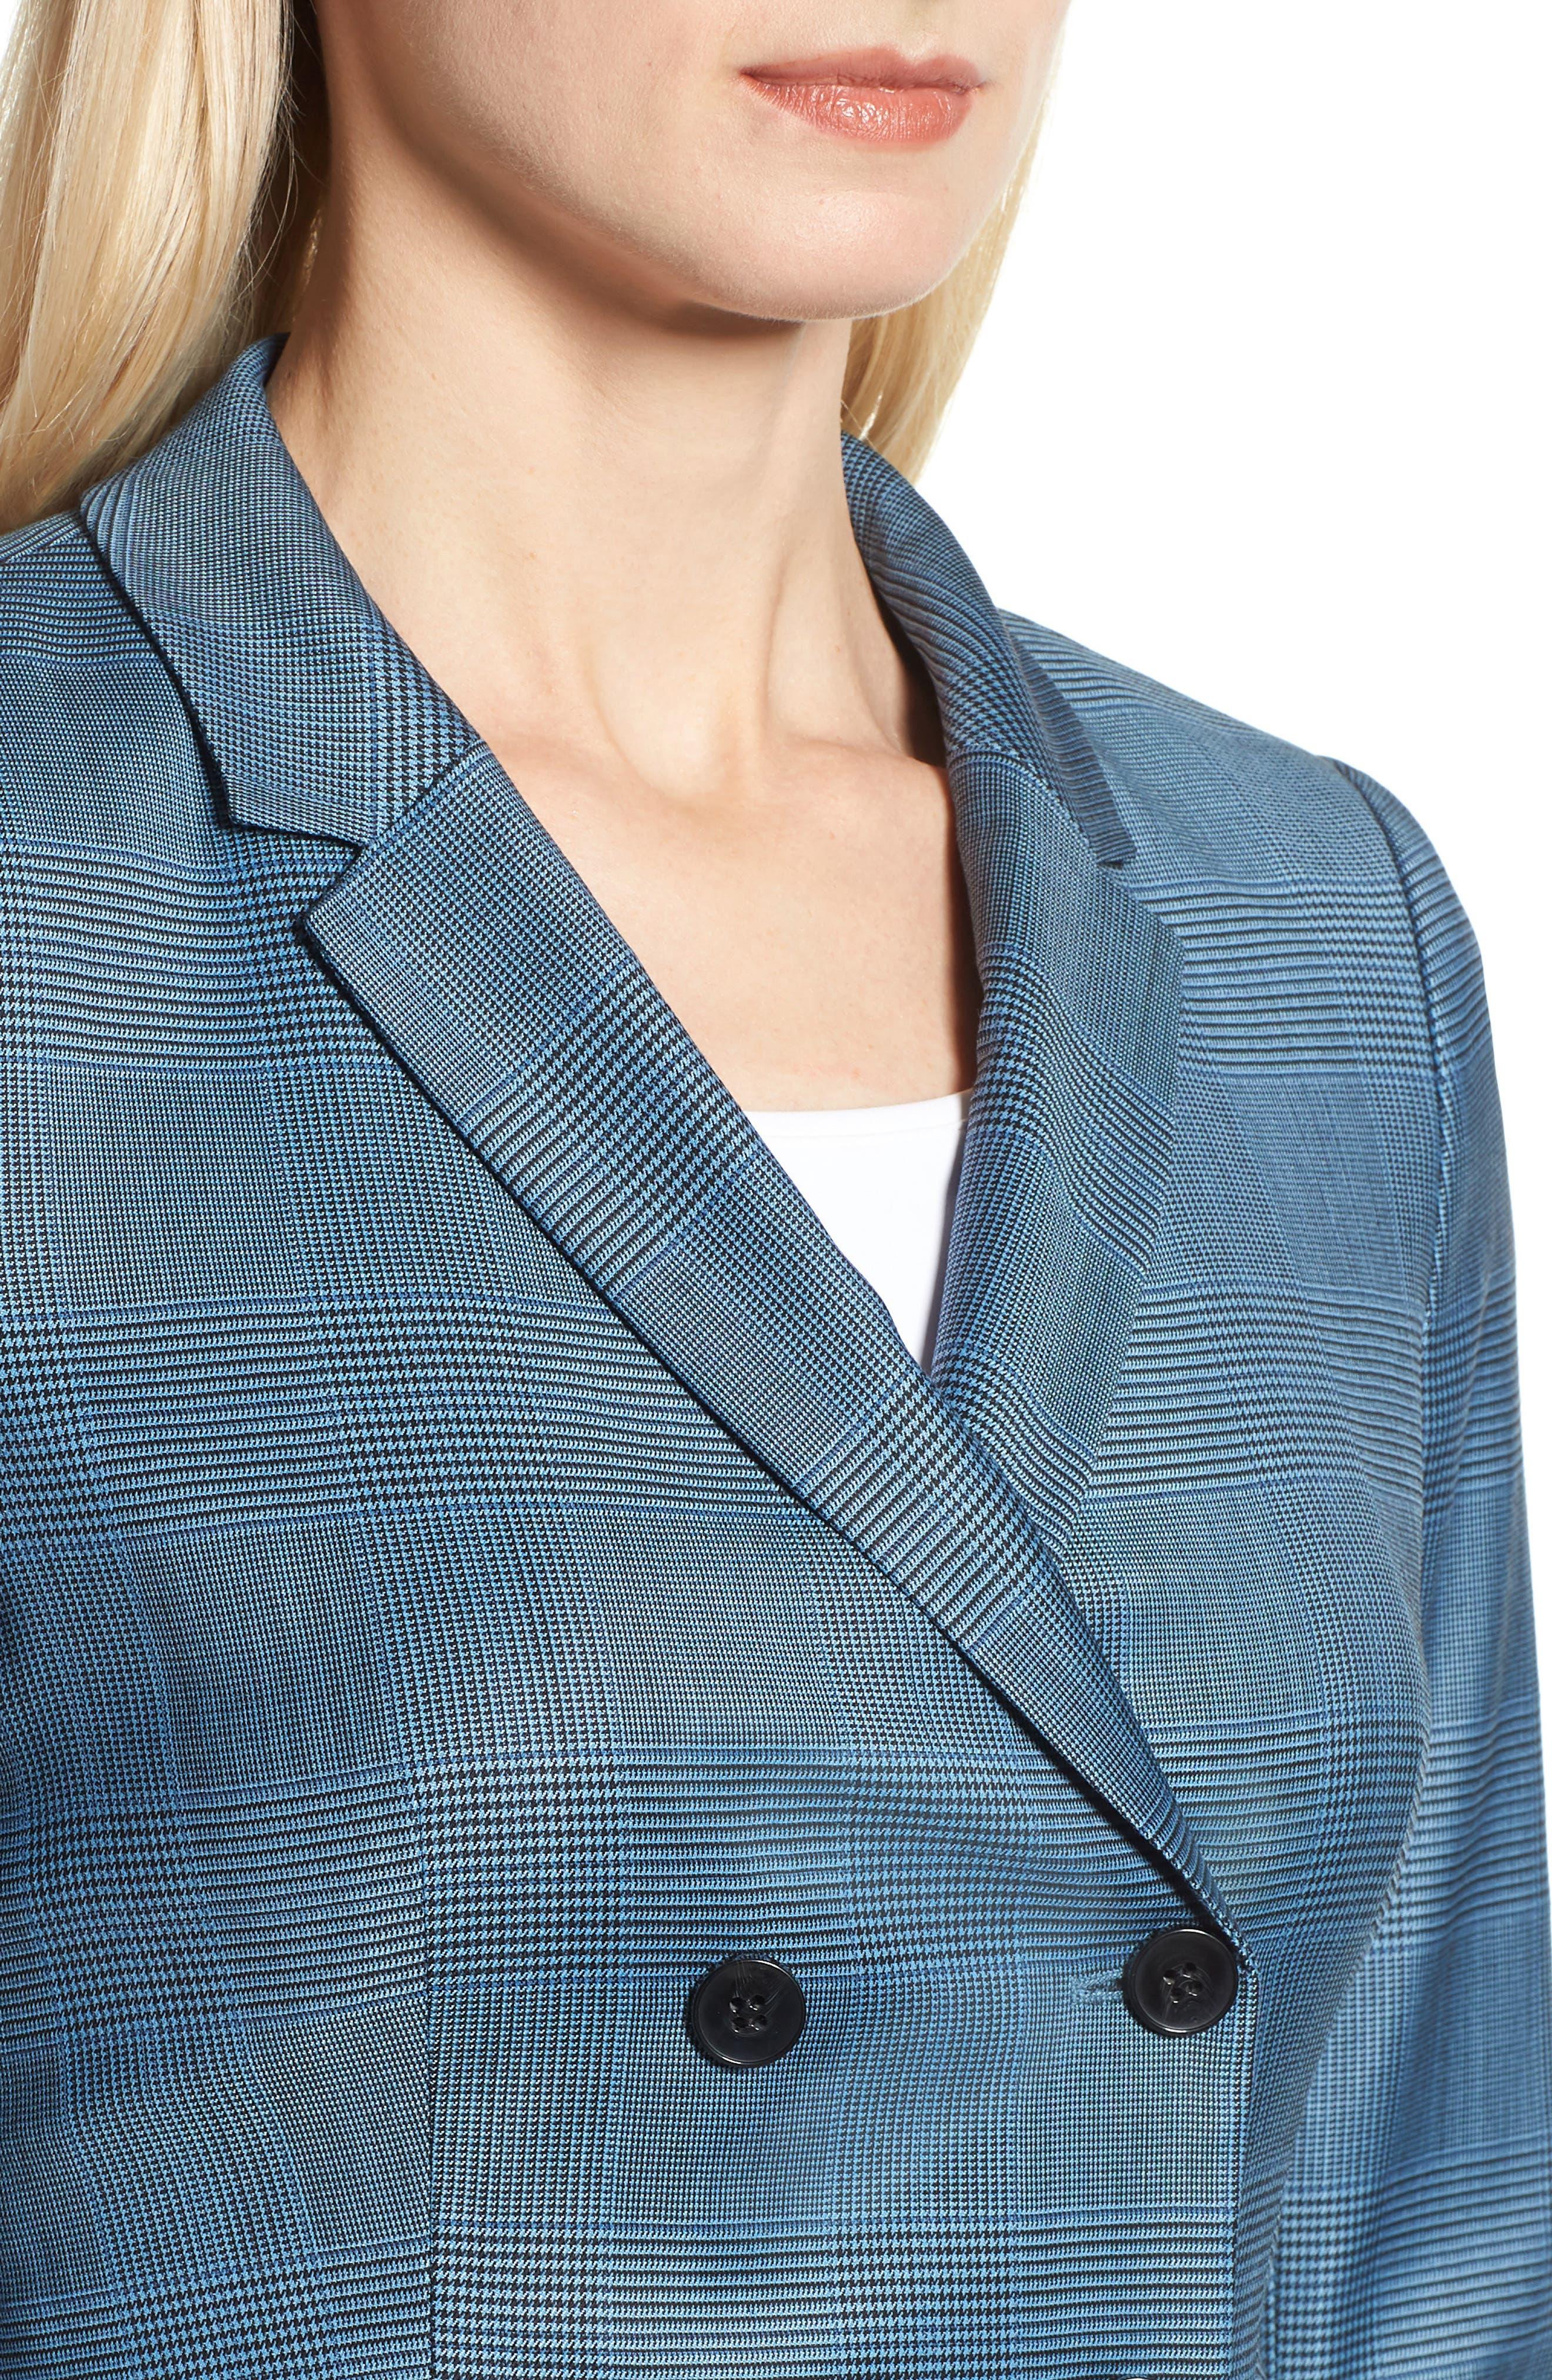 Jelaya Glencheck Double Breasted Suit Jacket,                             Alternate thumbnail 4, color,                             Sailor Blue Fantasy